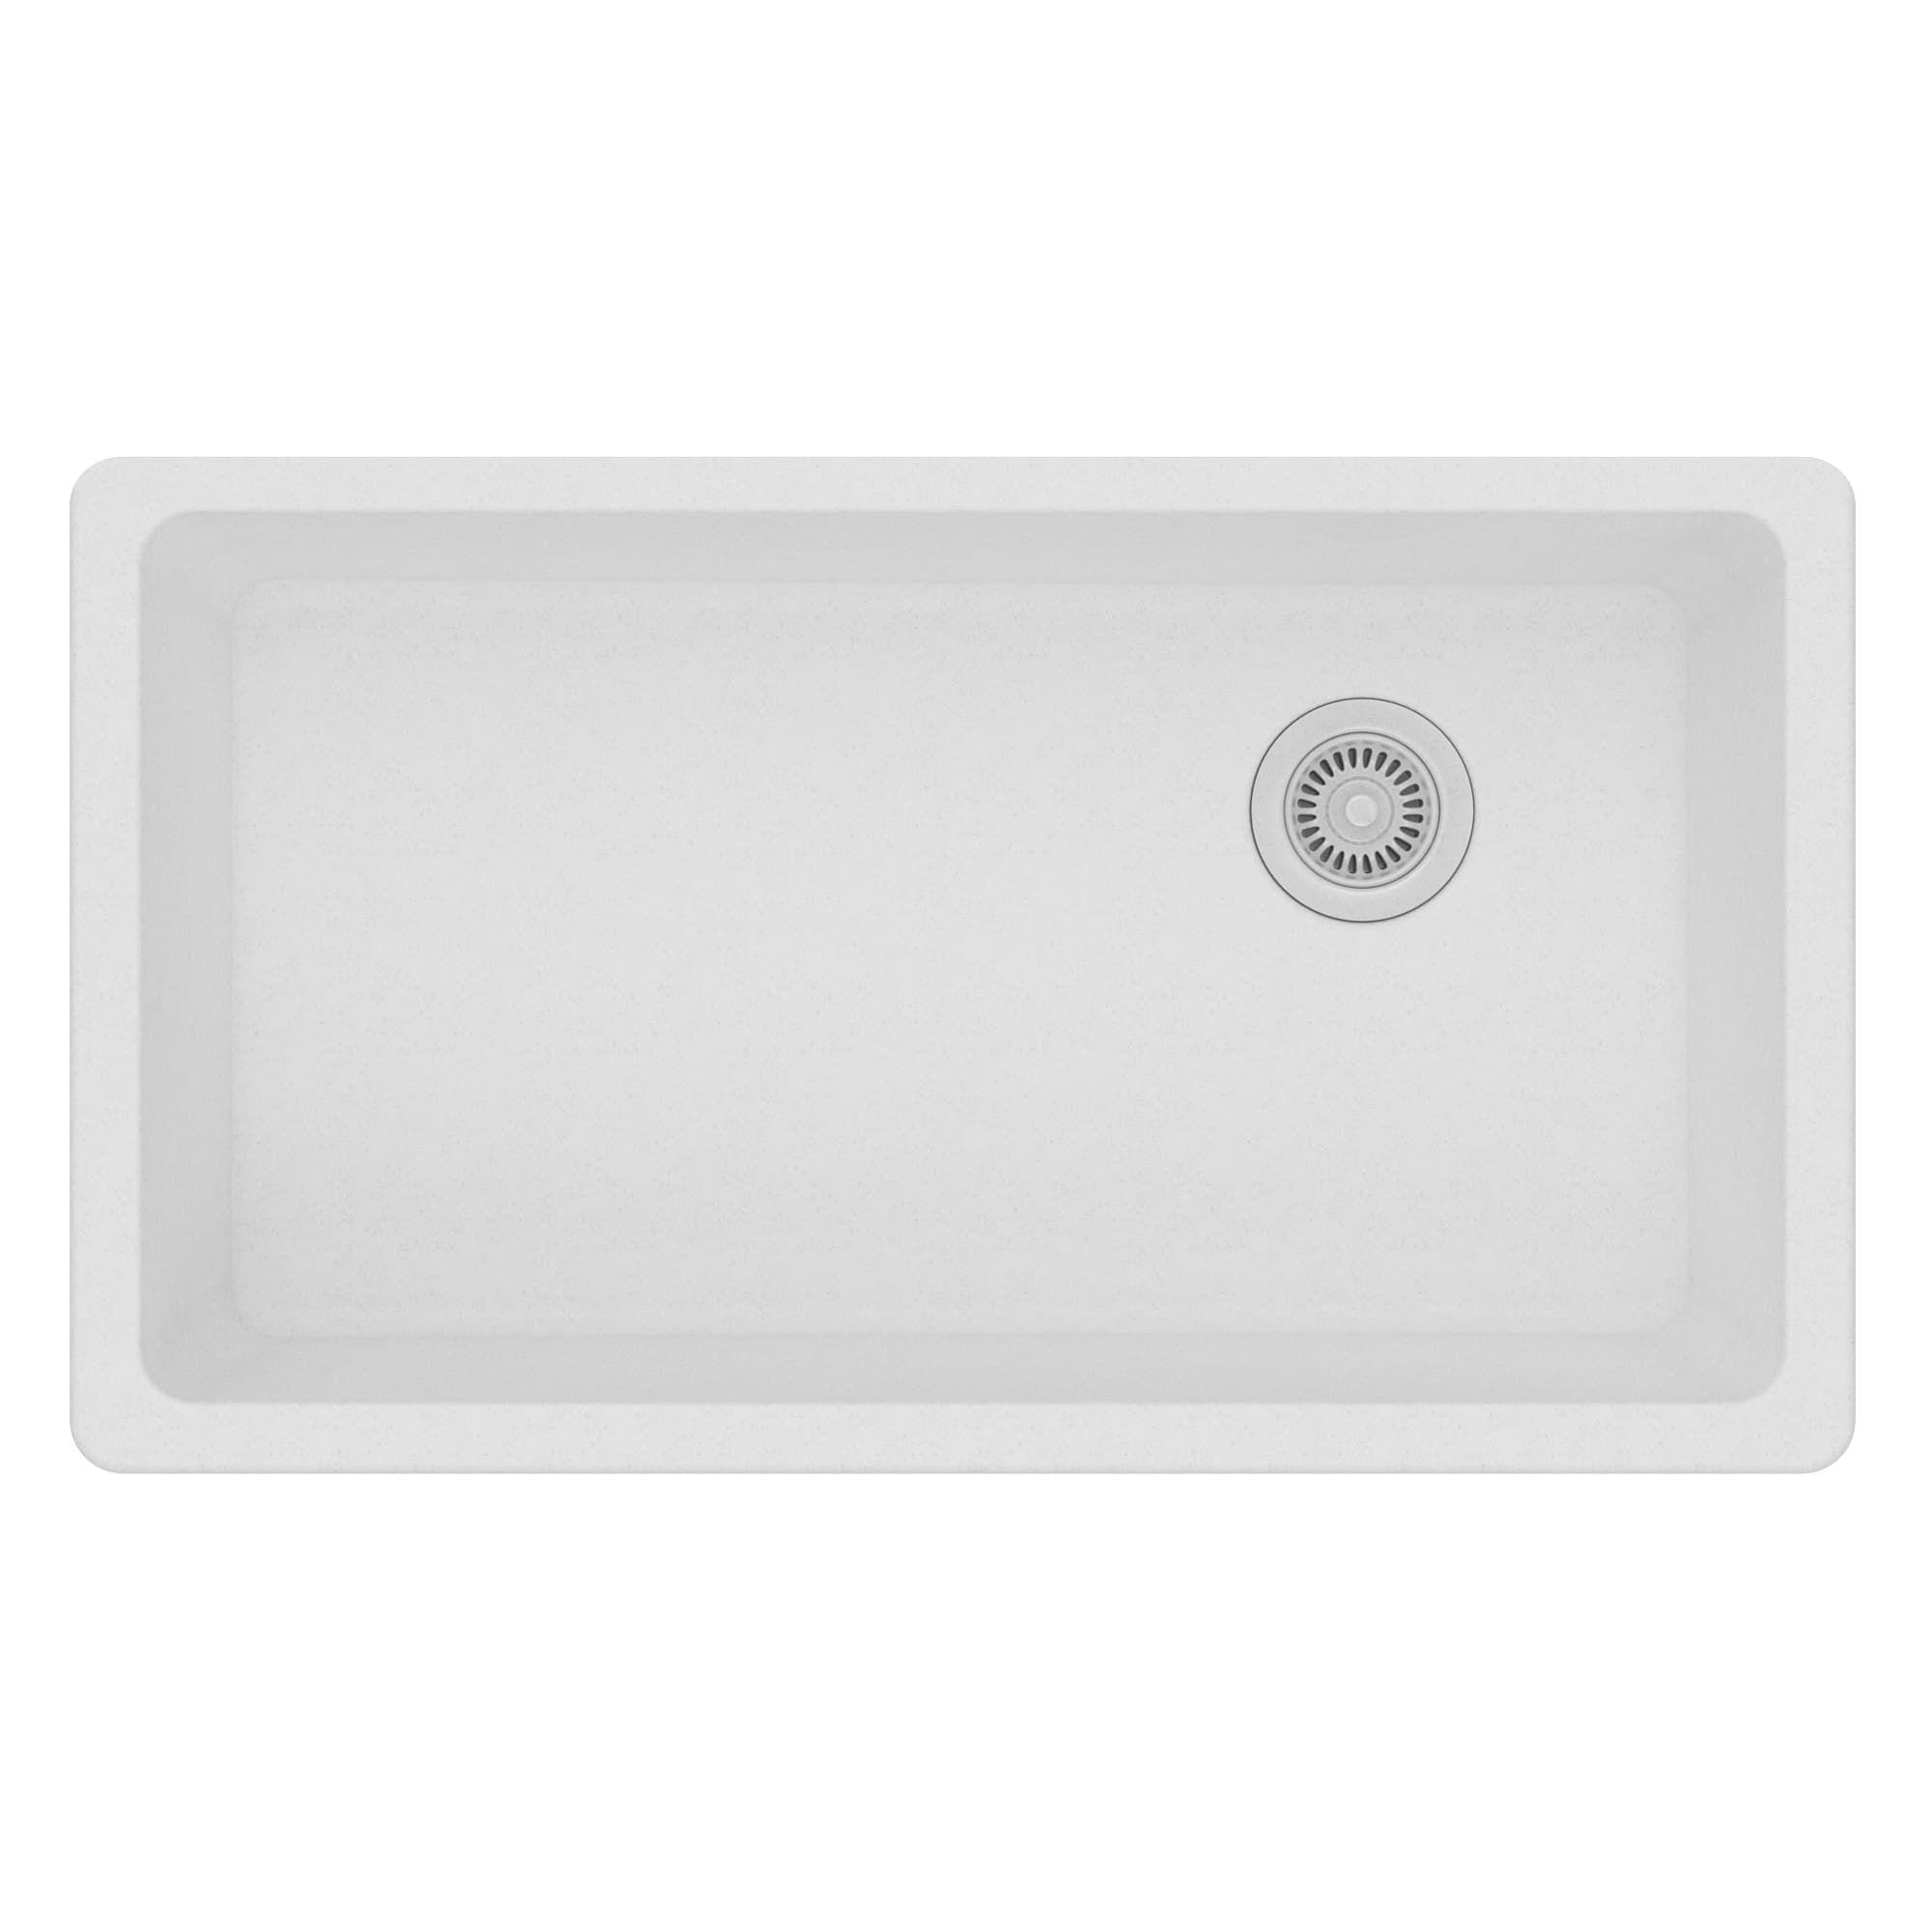 Elkay Quartz Classic Granite Single Bowl Undermount Kitchen Sink ...